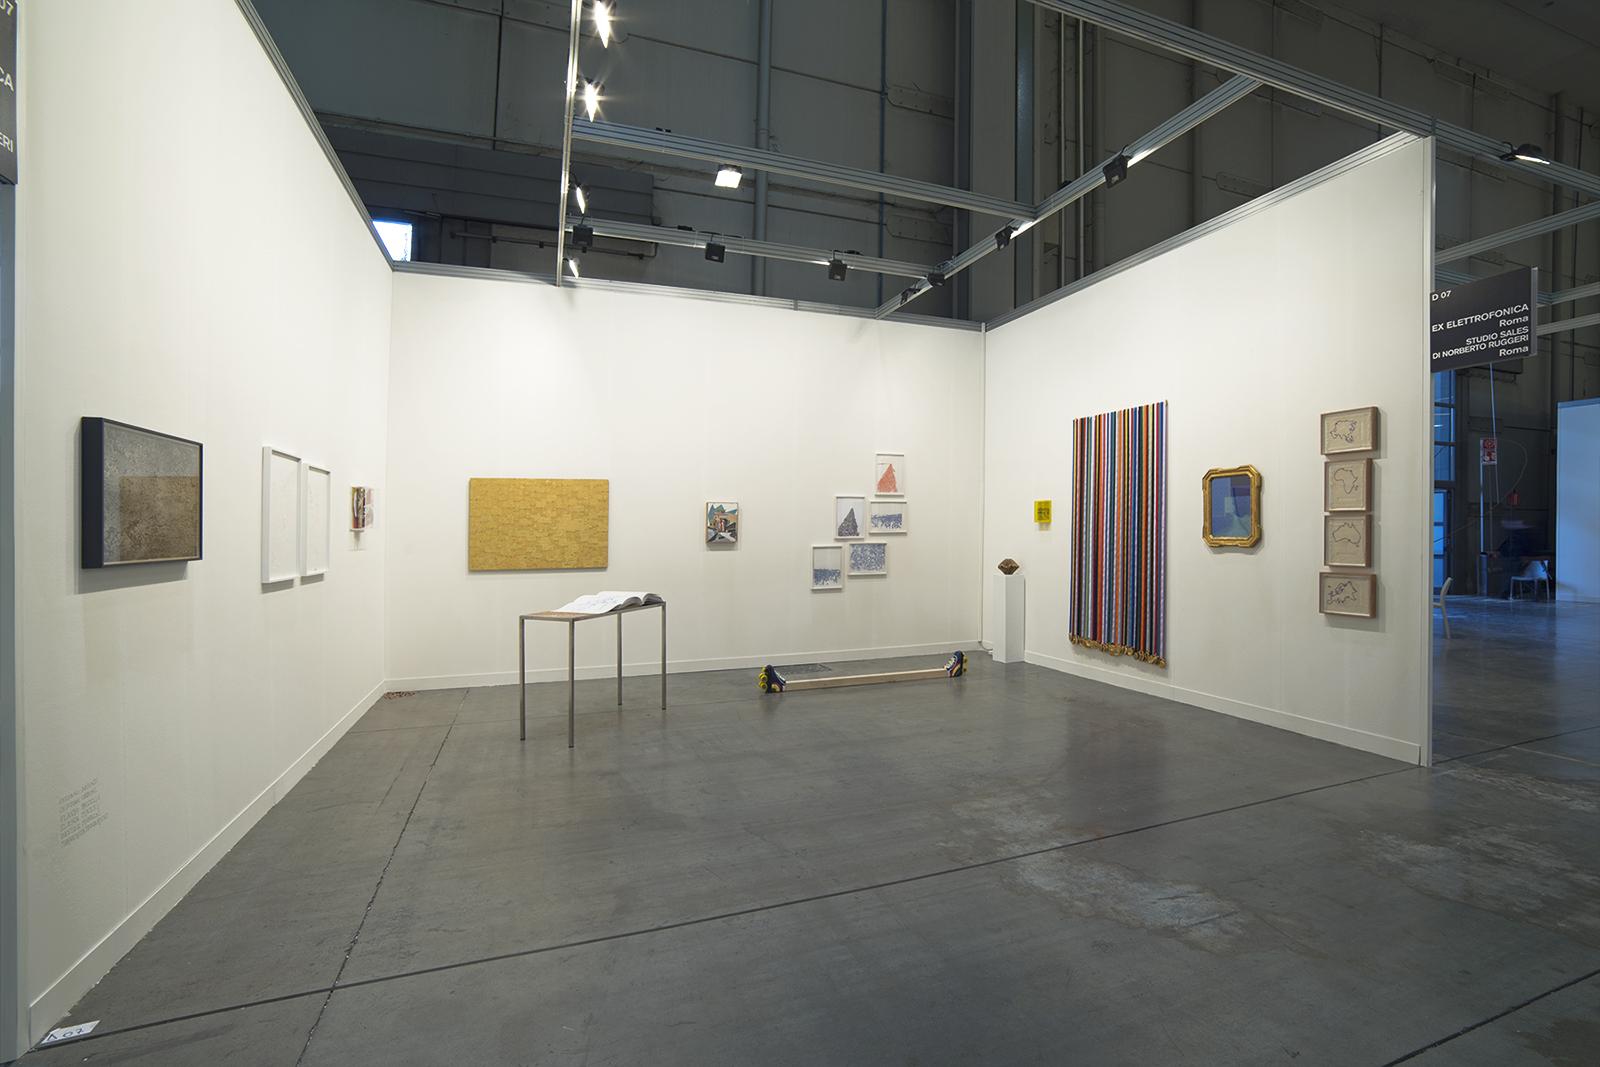 MIART 2017